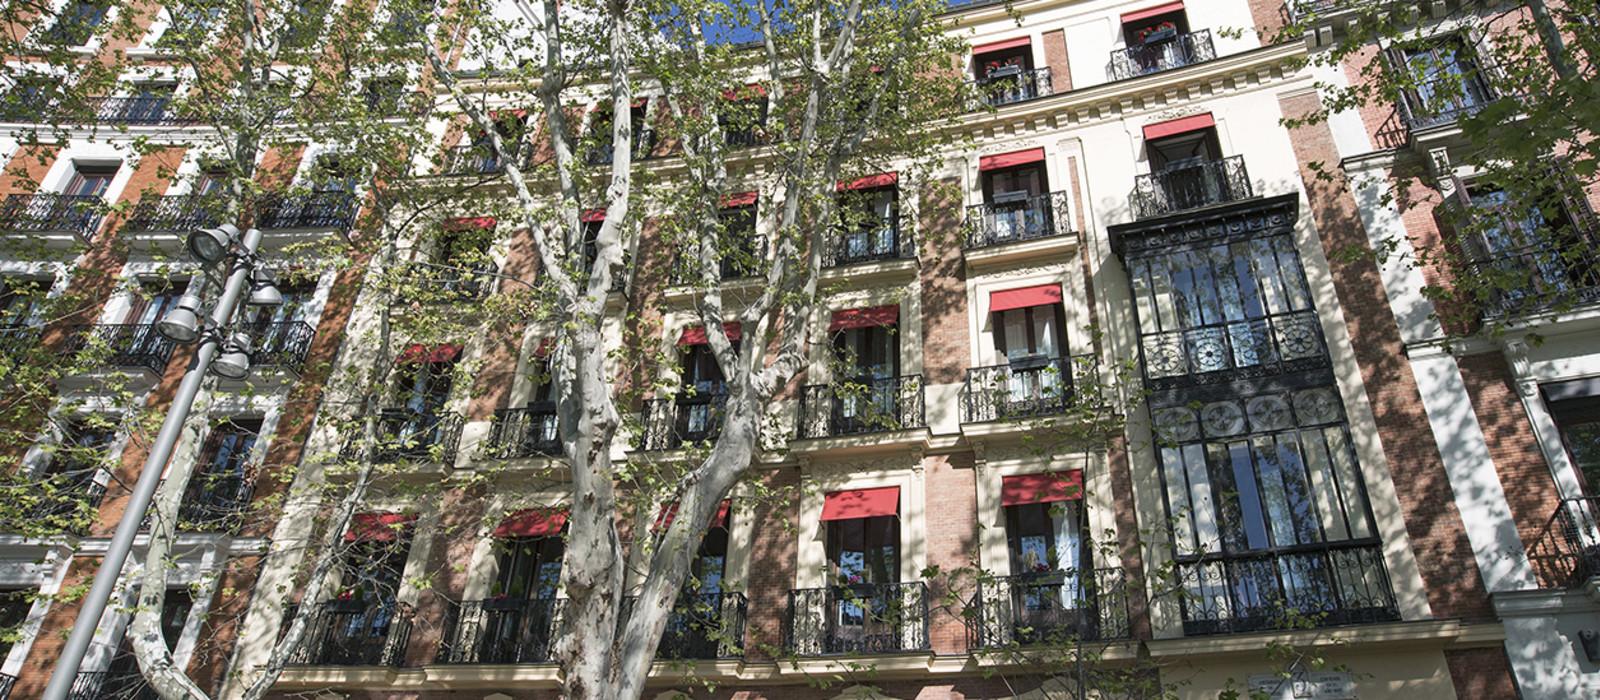 Hotel Hospes Puerta de Alcala Spain